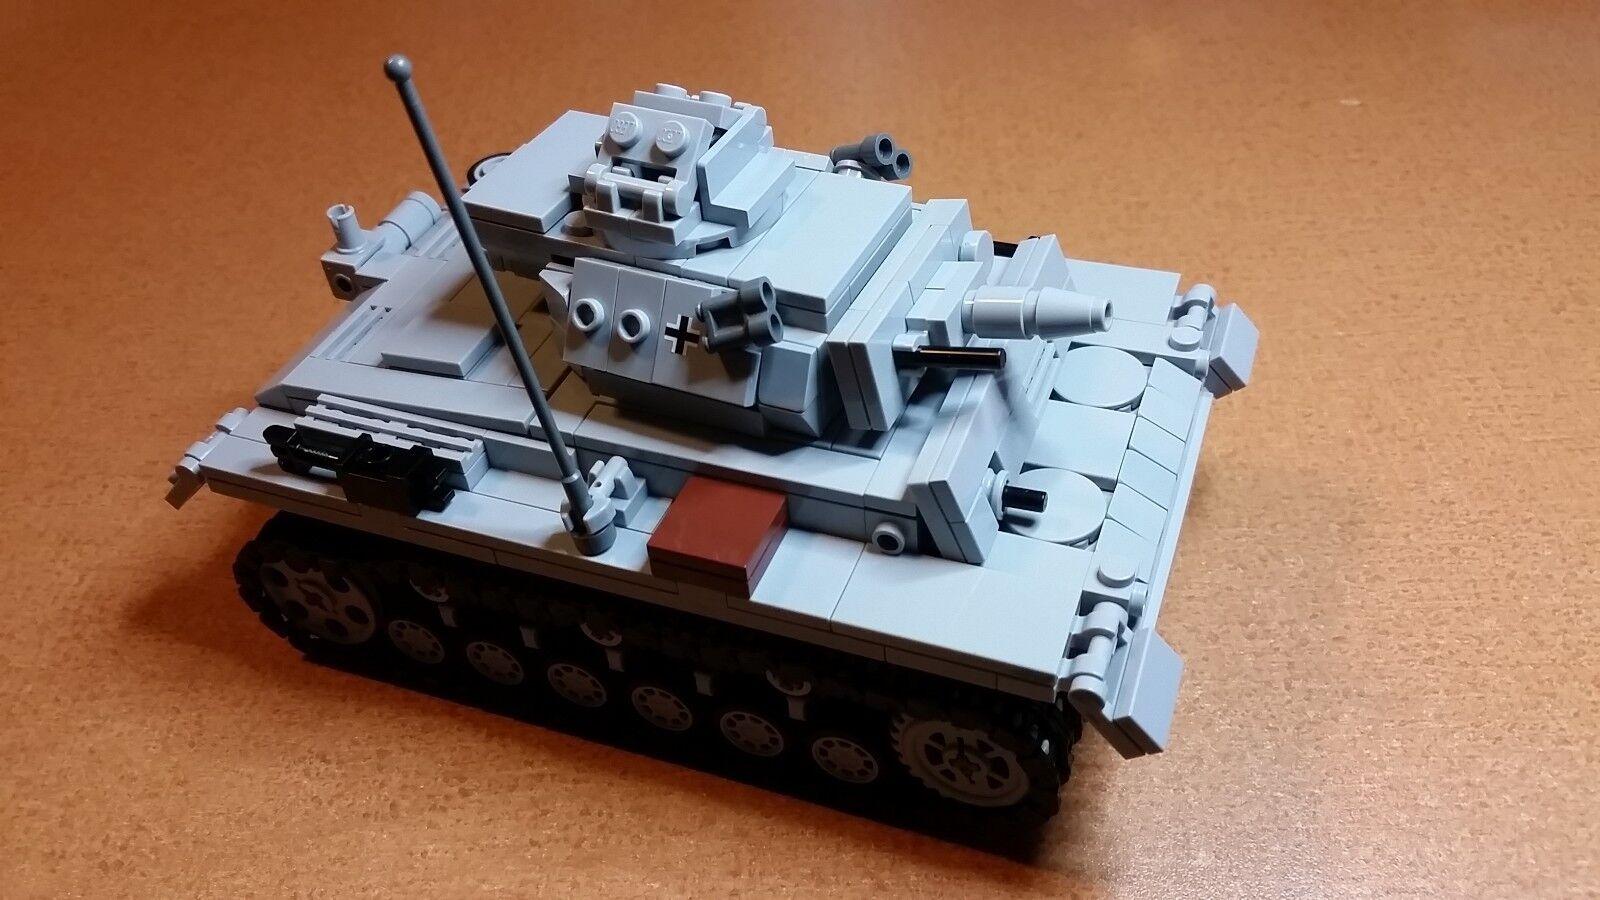 Lego WW2 GERMAN Vehicle PANZER III ausf. N TANK Artillery NEW